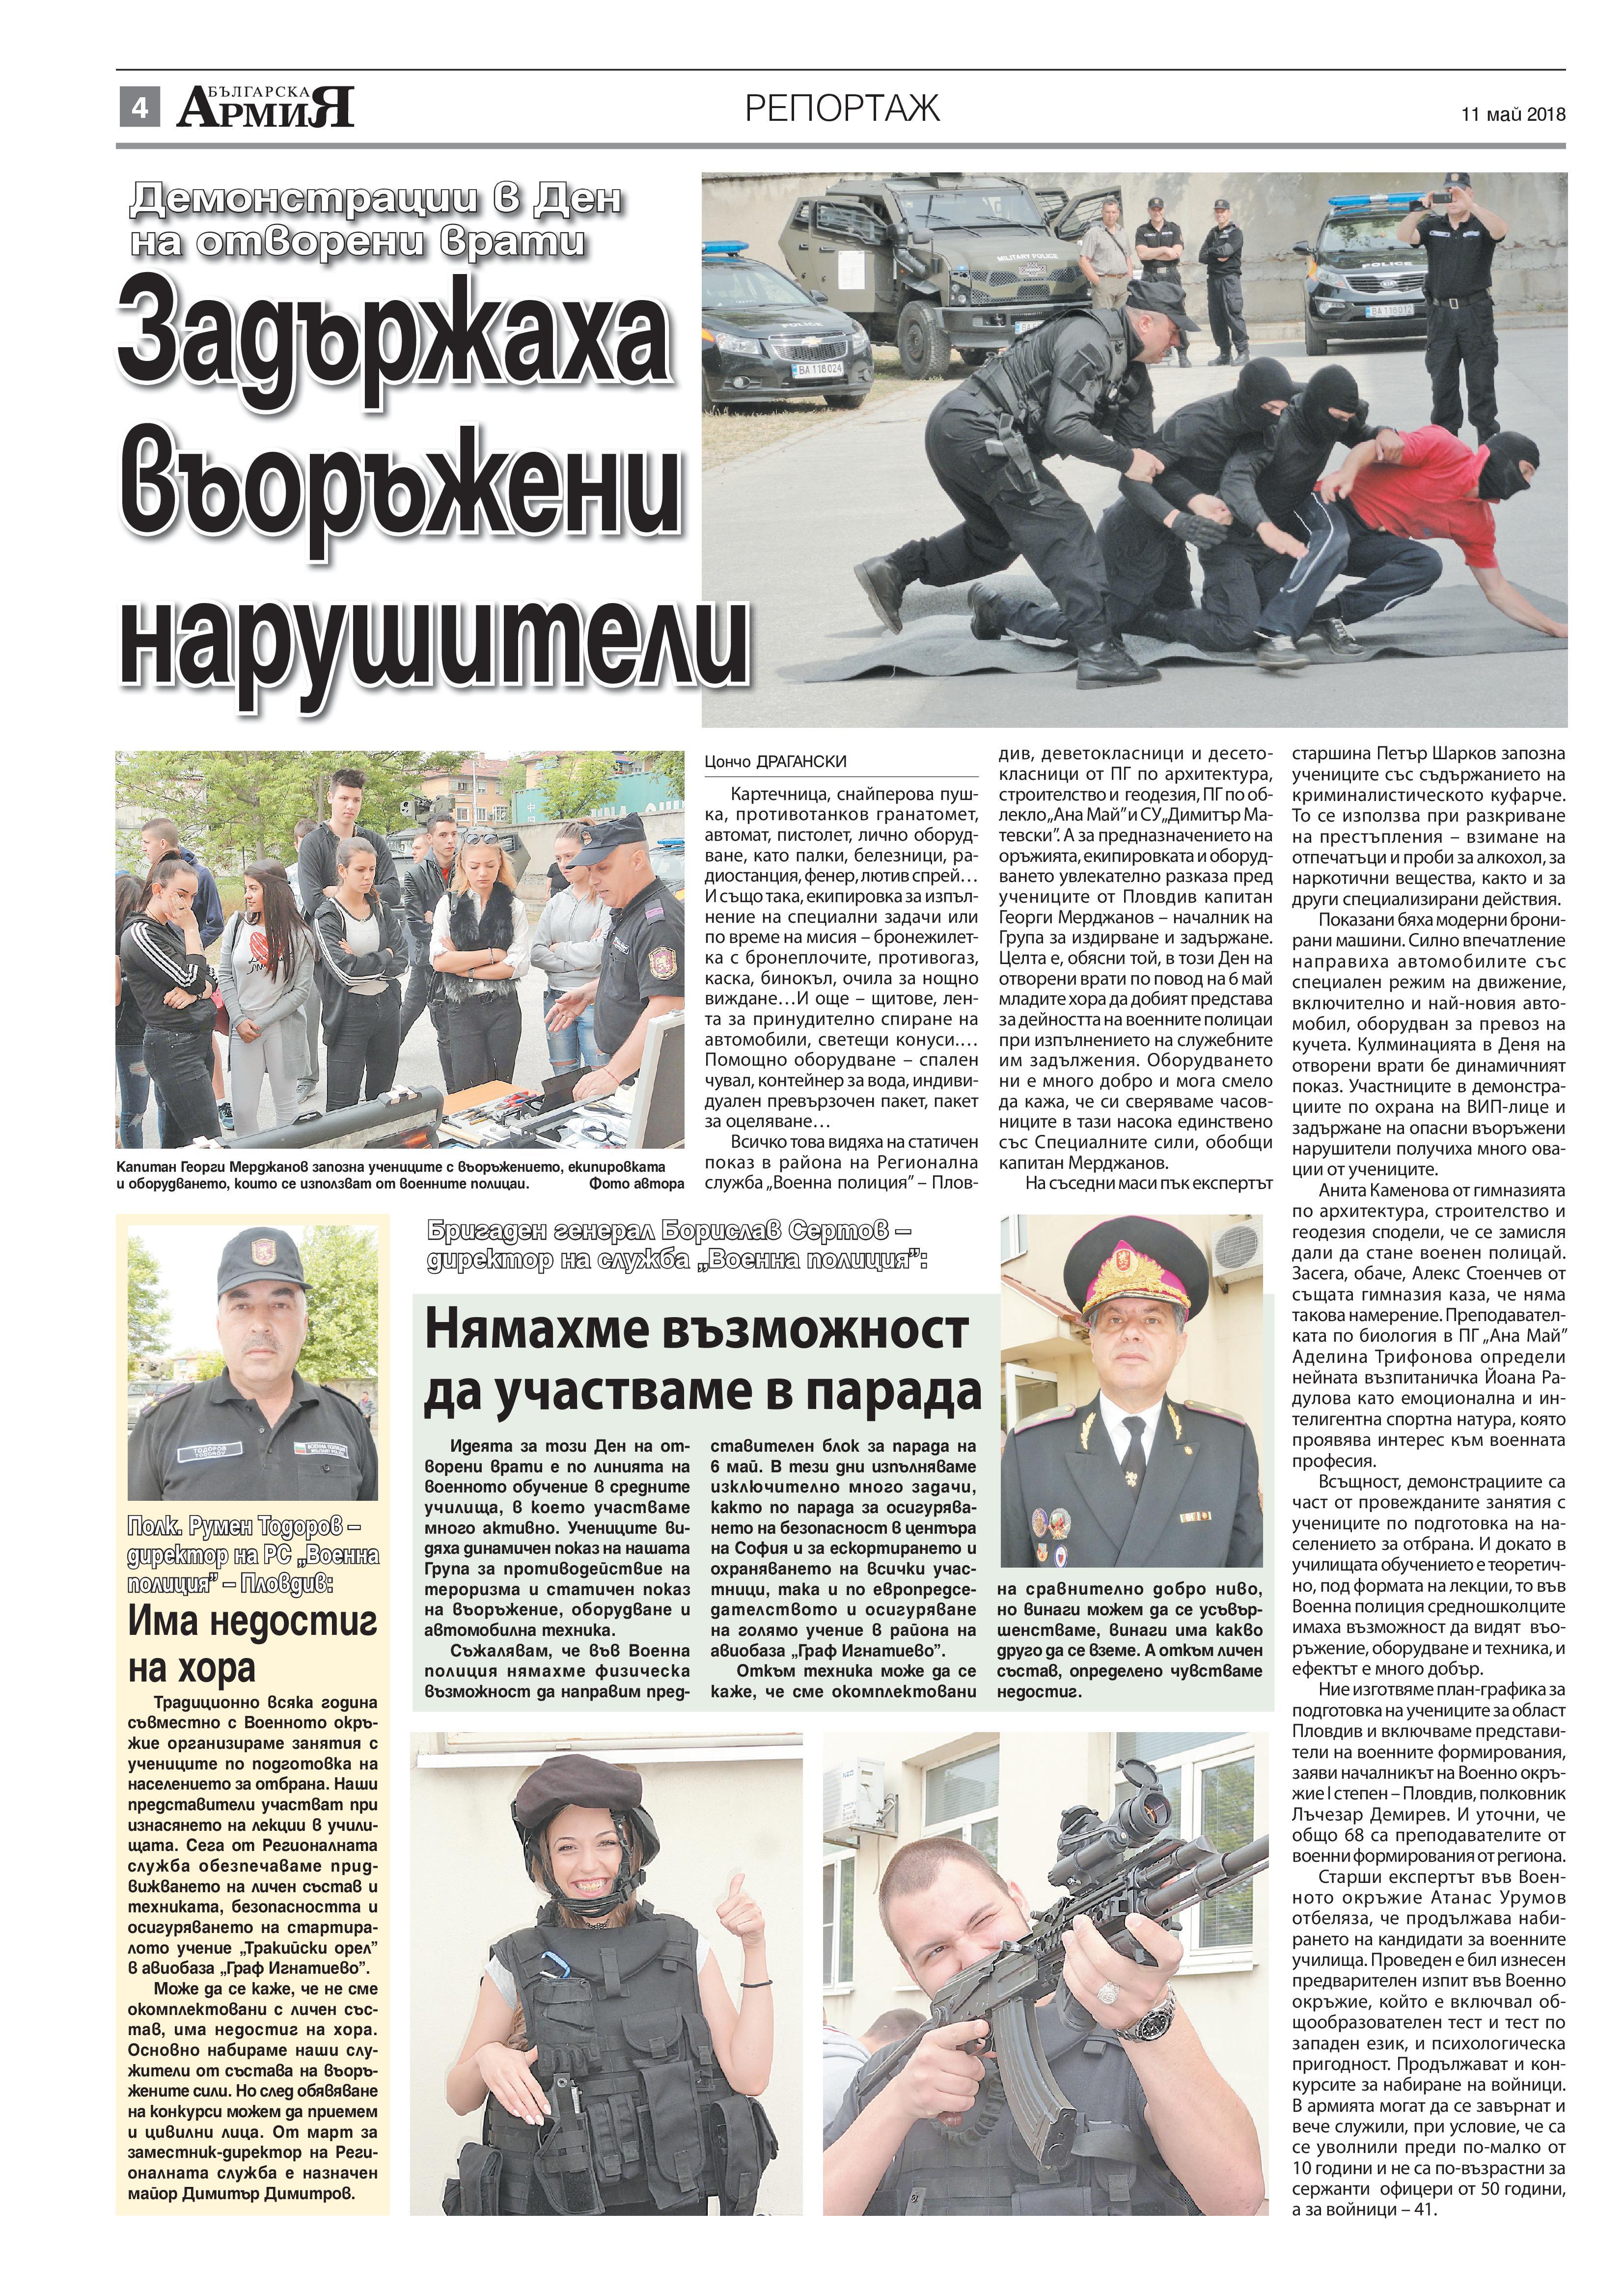 https://armymedia.bg/wp-content/uploads/2015/06/04-20.jpg